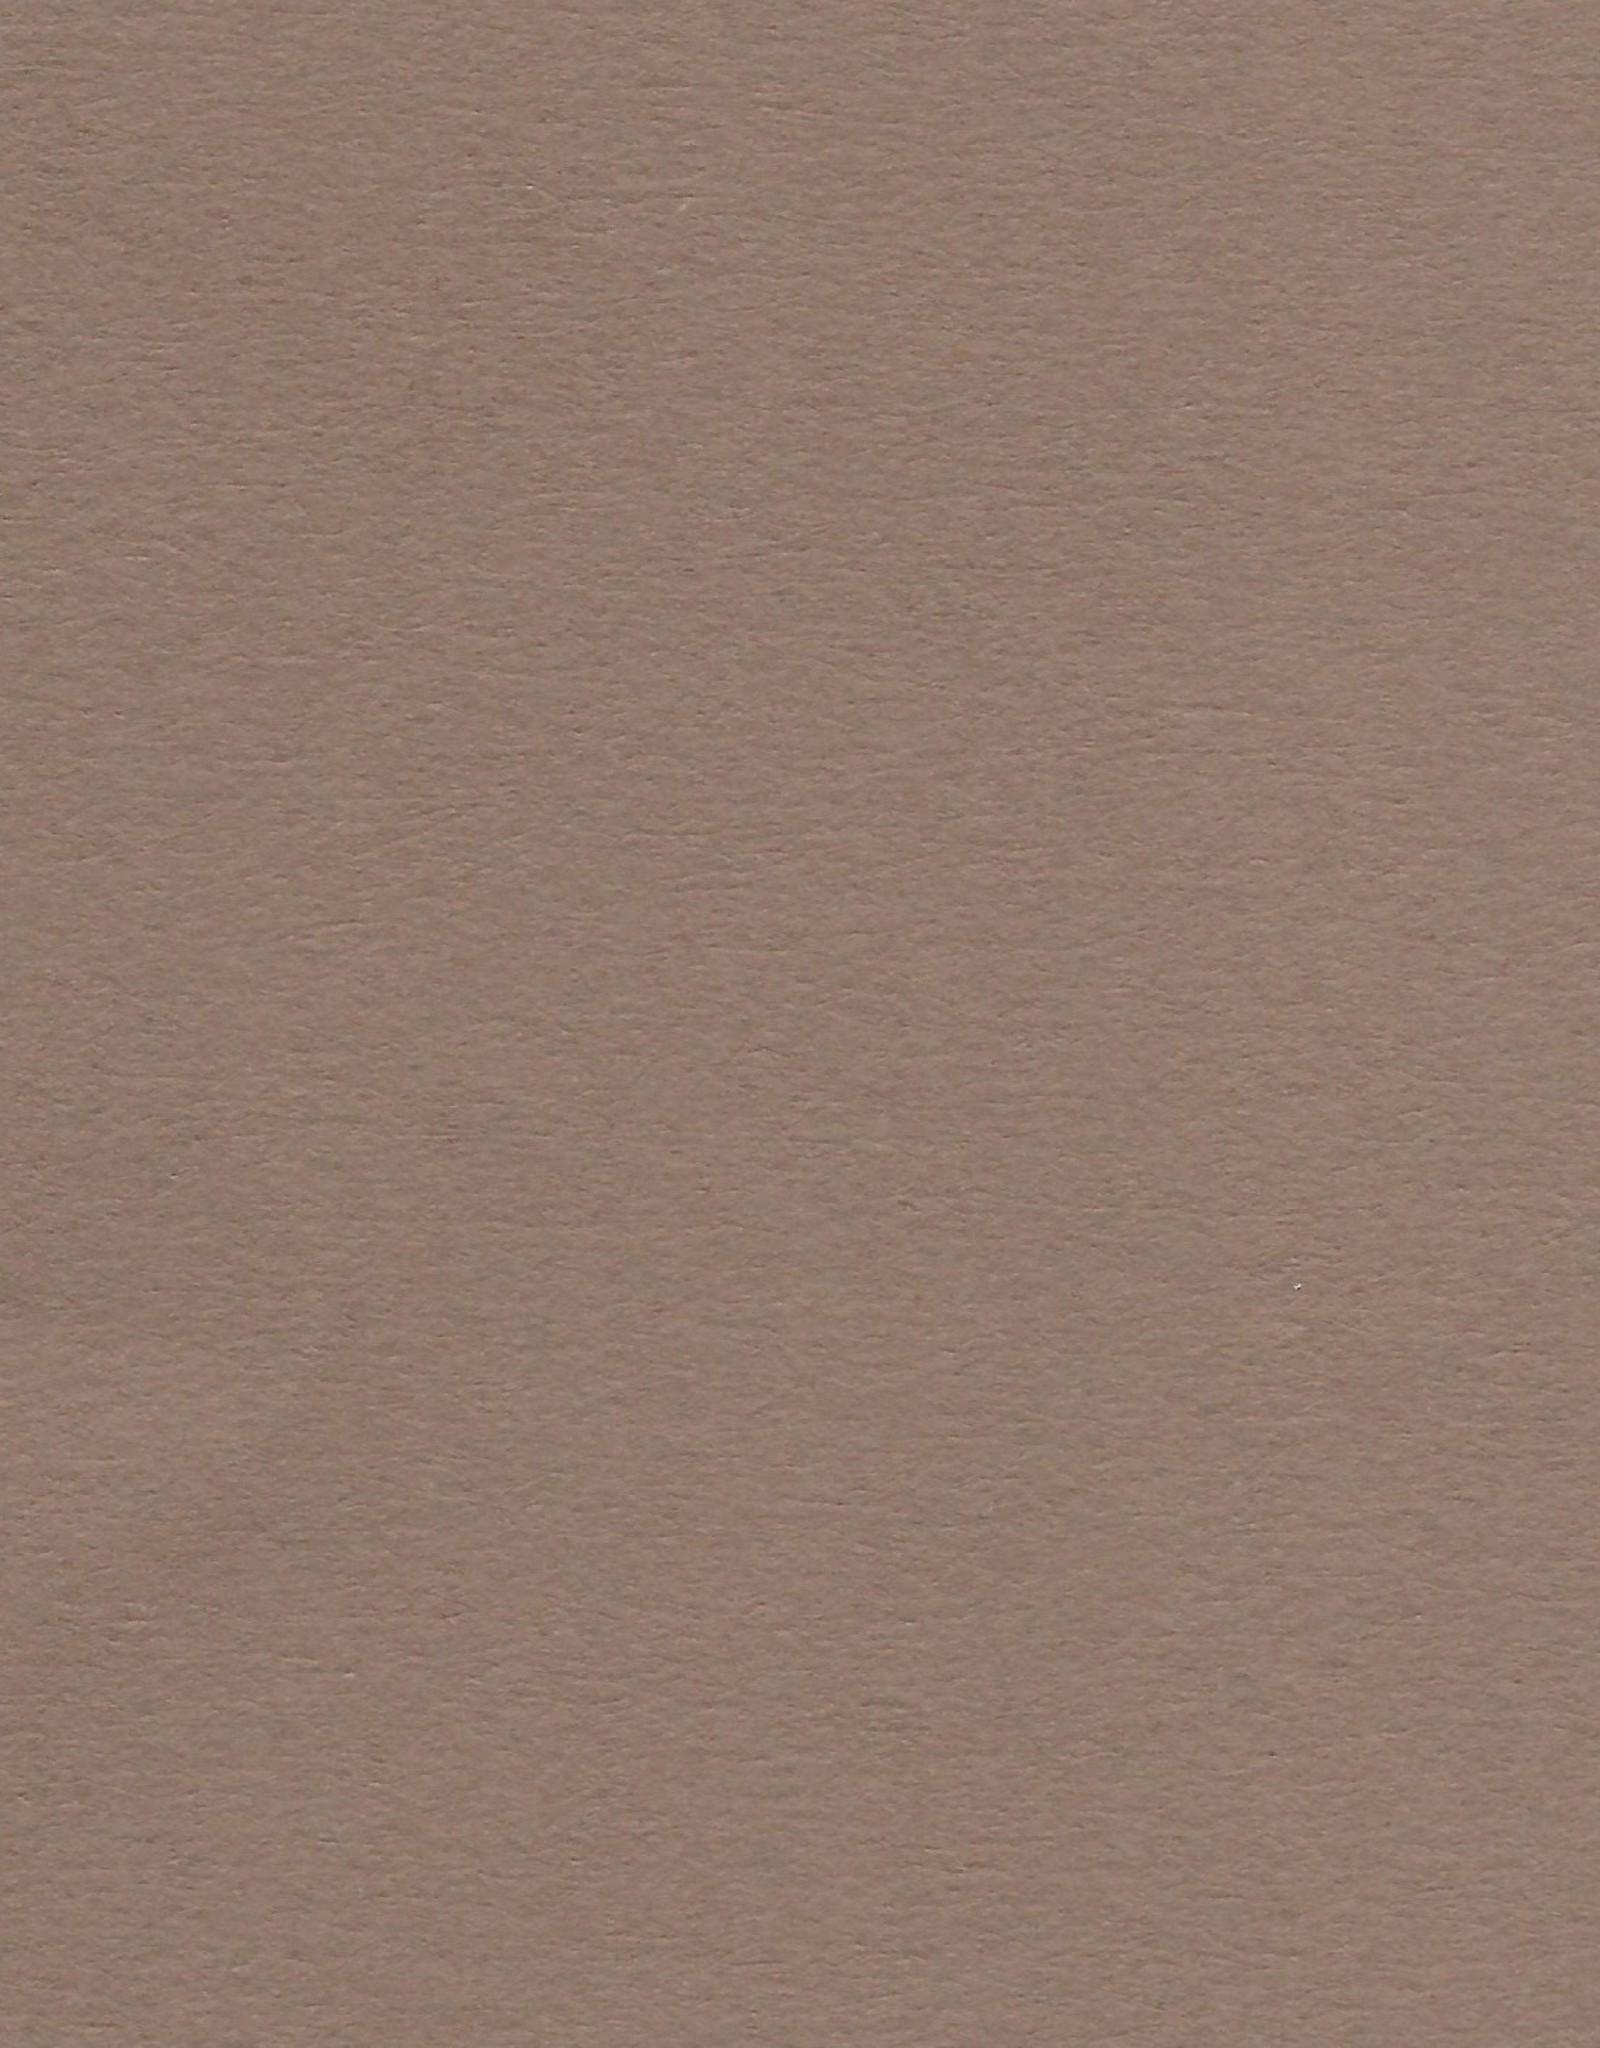 "Colorplan, 91#, Text, Nubuck Brown, 25"" x 38"", 135 gsm"